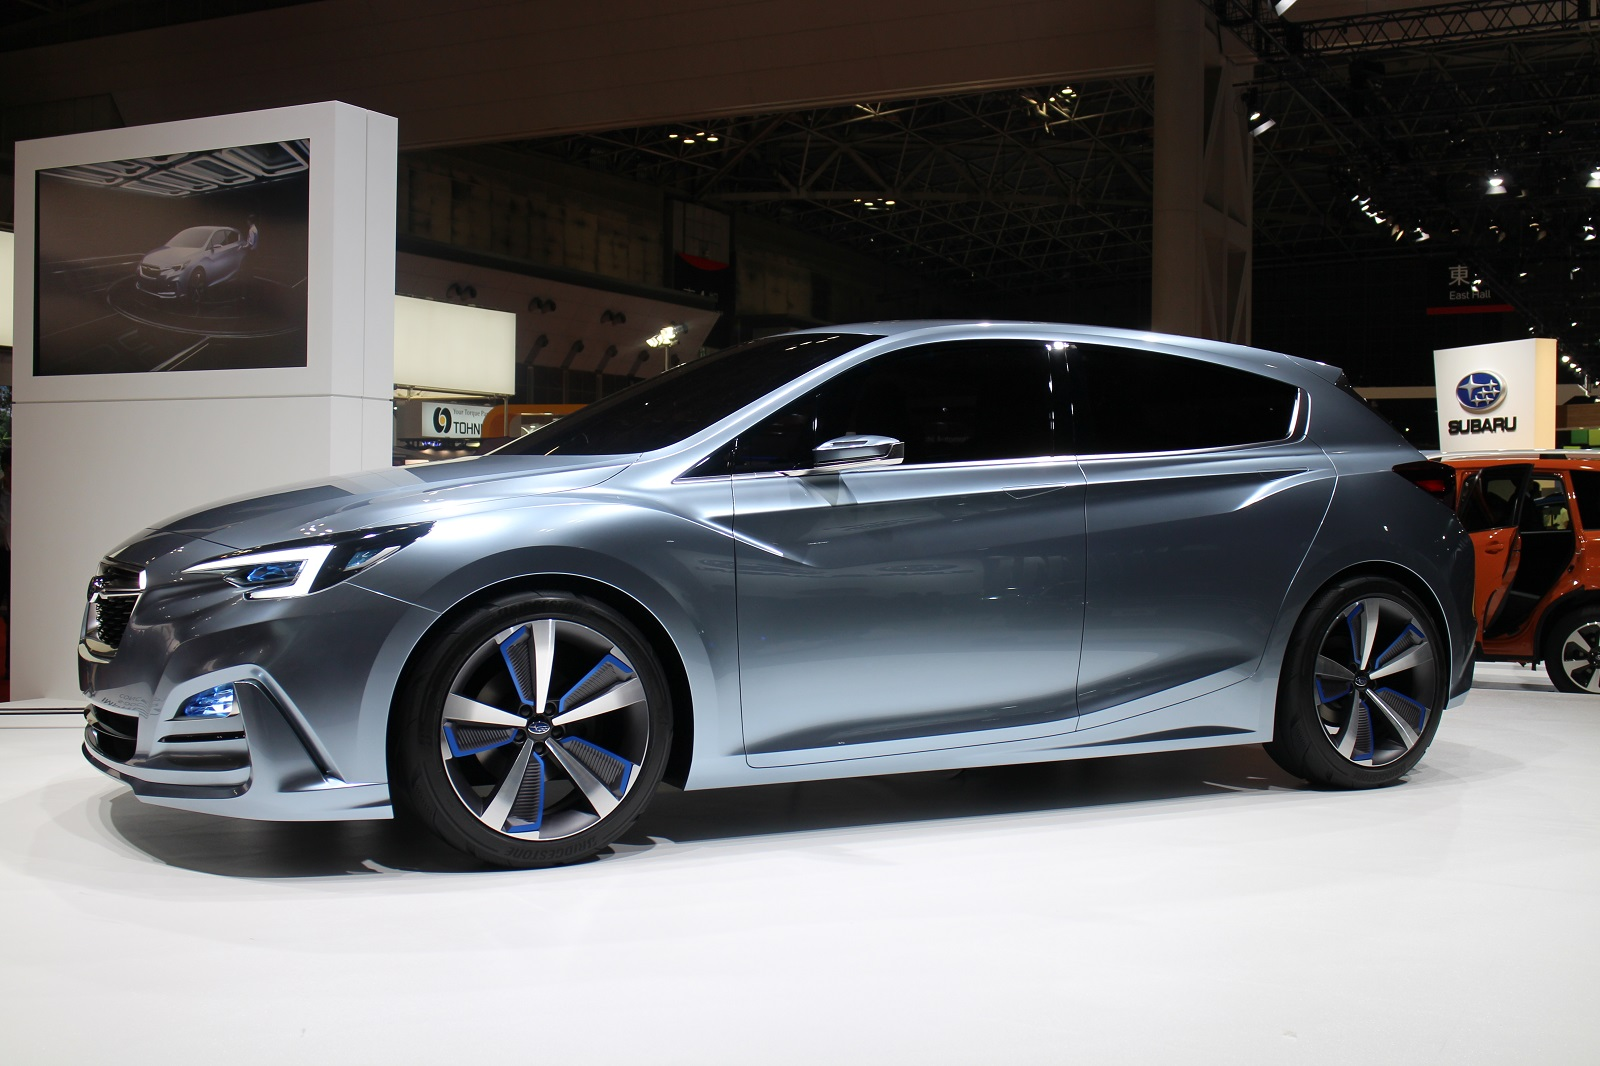 Subaru impreza 5 door concept tokyo motor show live photos amp video